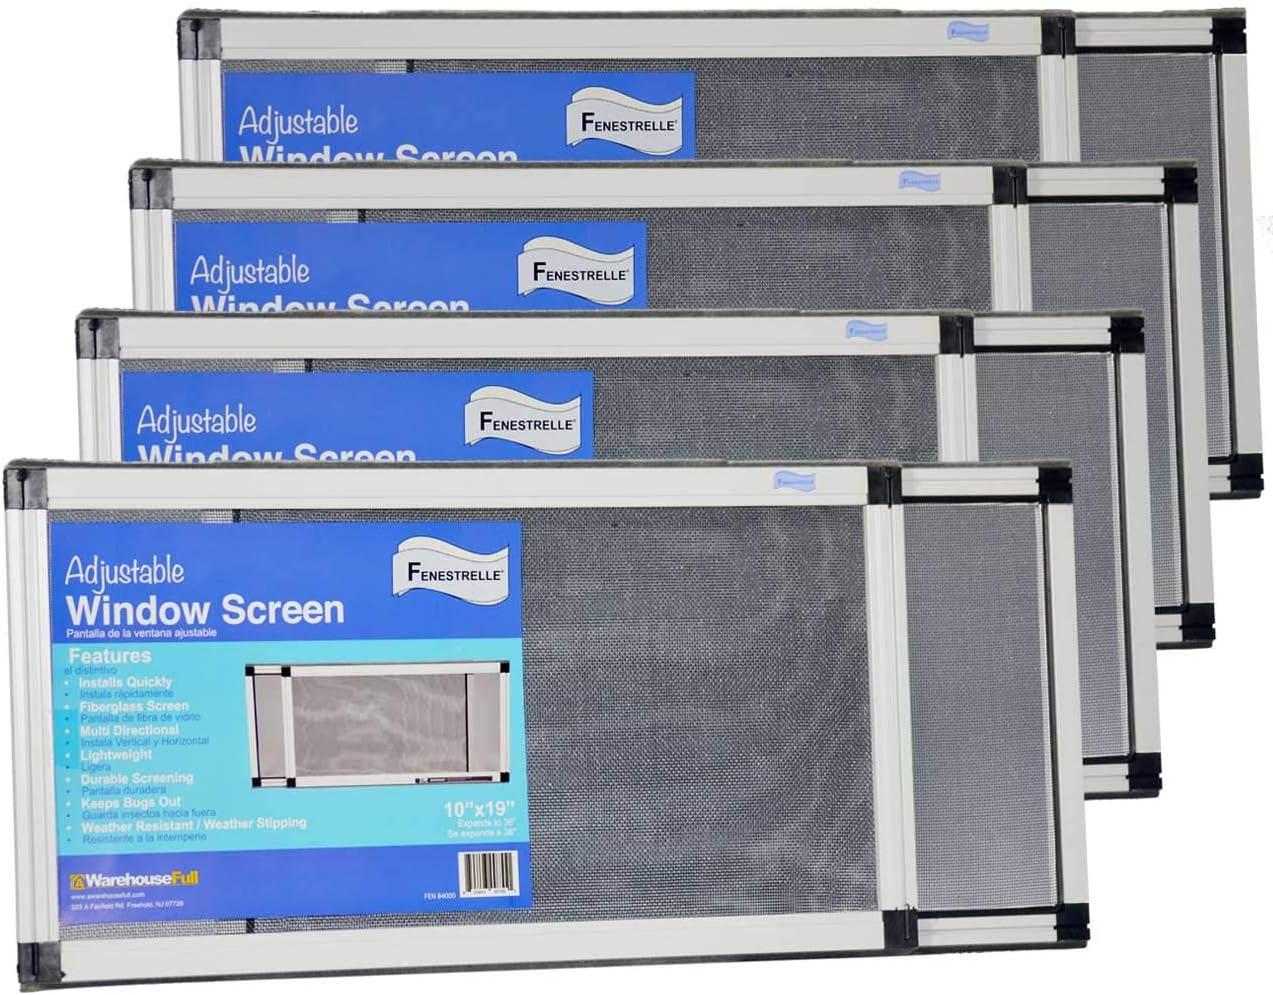 "Fenestrelle Adjustable Window Screen, 2 Way Adjustable, Horizontal, (10"" fits 19-36""w) or Convert to Vertical (19"" fits 10-18""w) - 4 Pack"